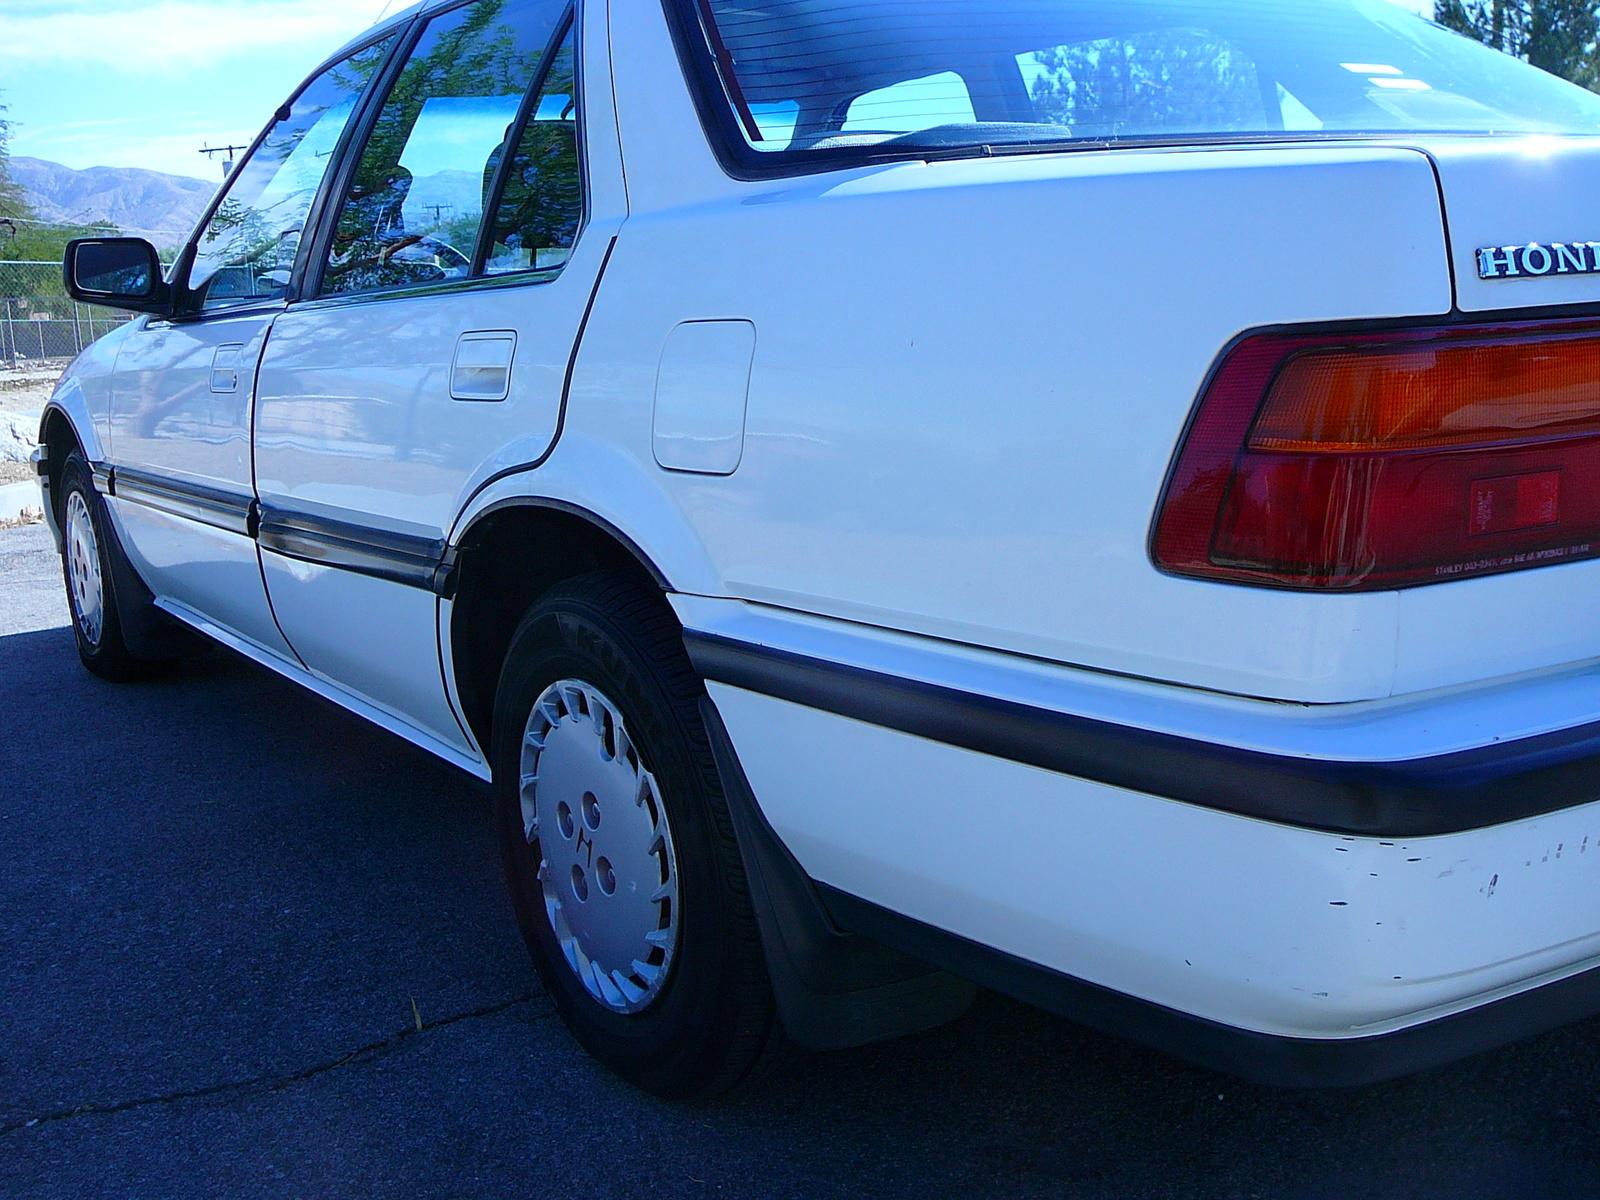 1989 Honda Accord - Overview - CarGurus